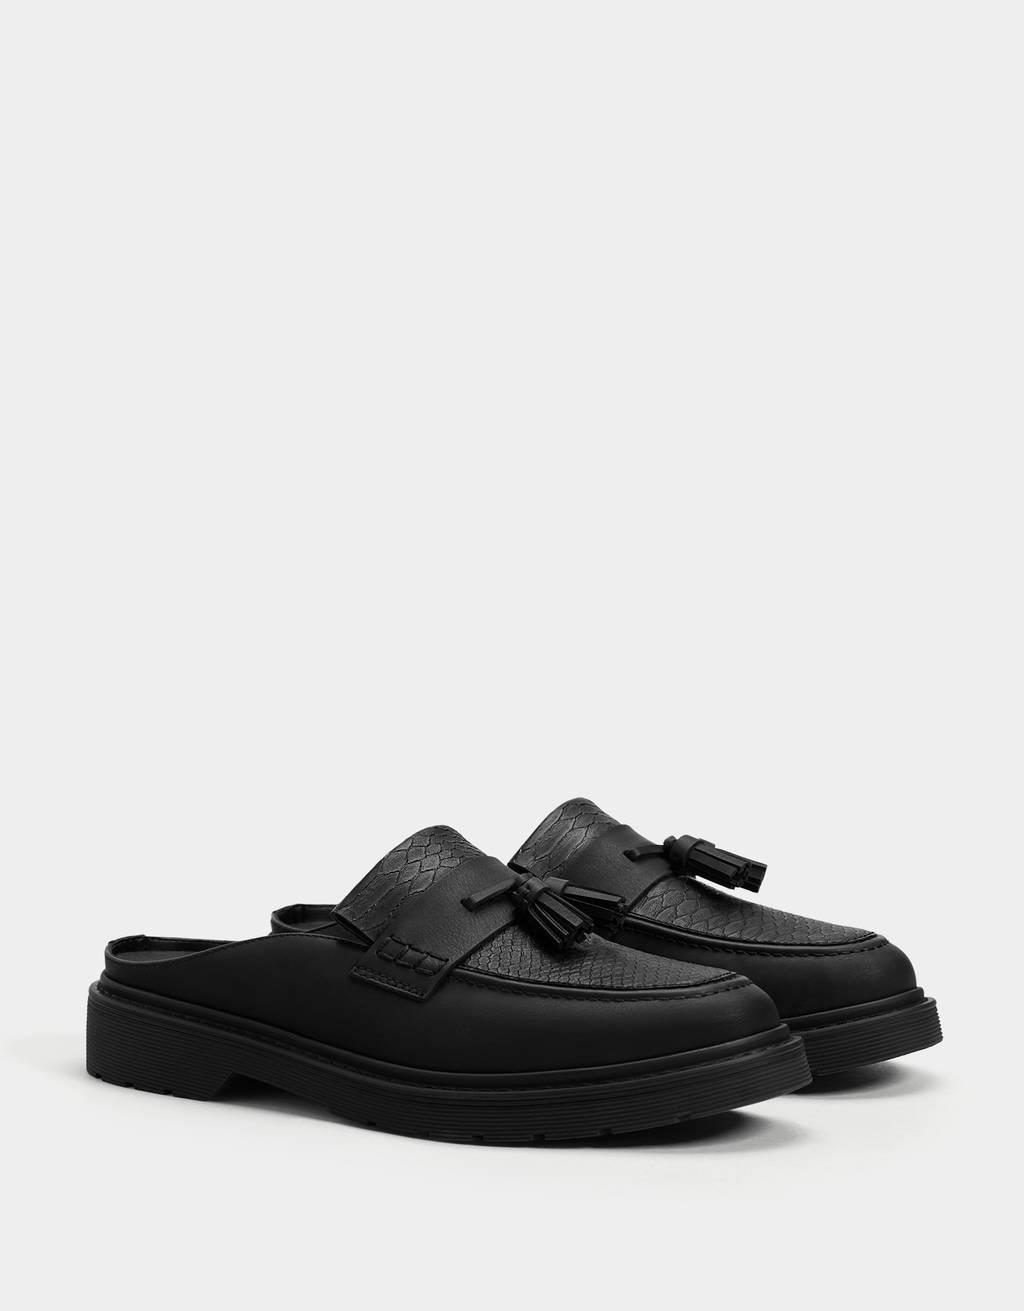 Tassel loafer mules